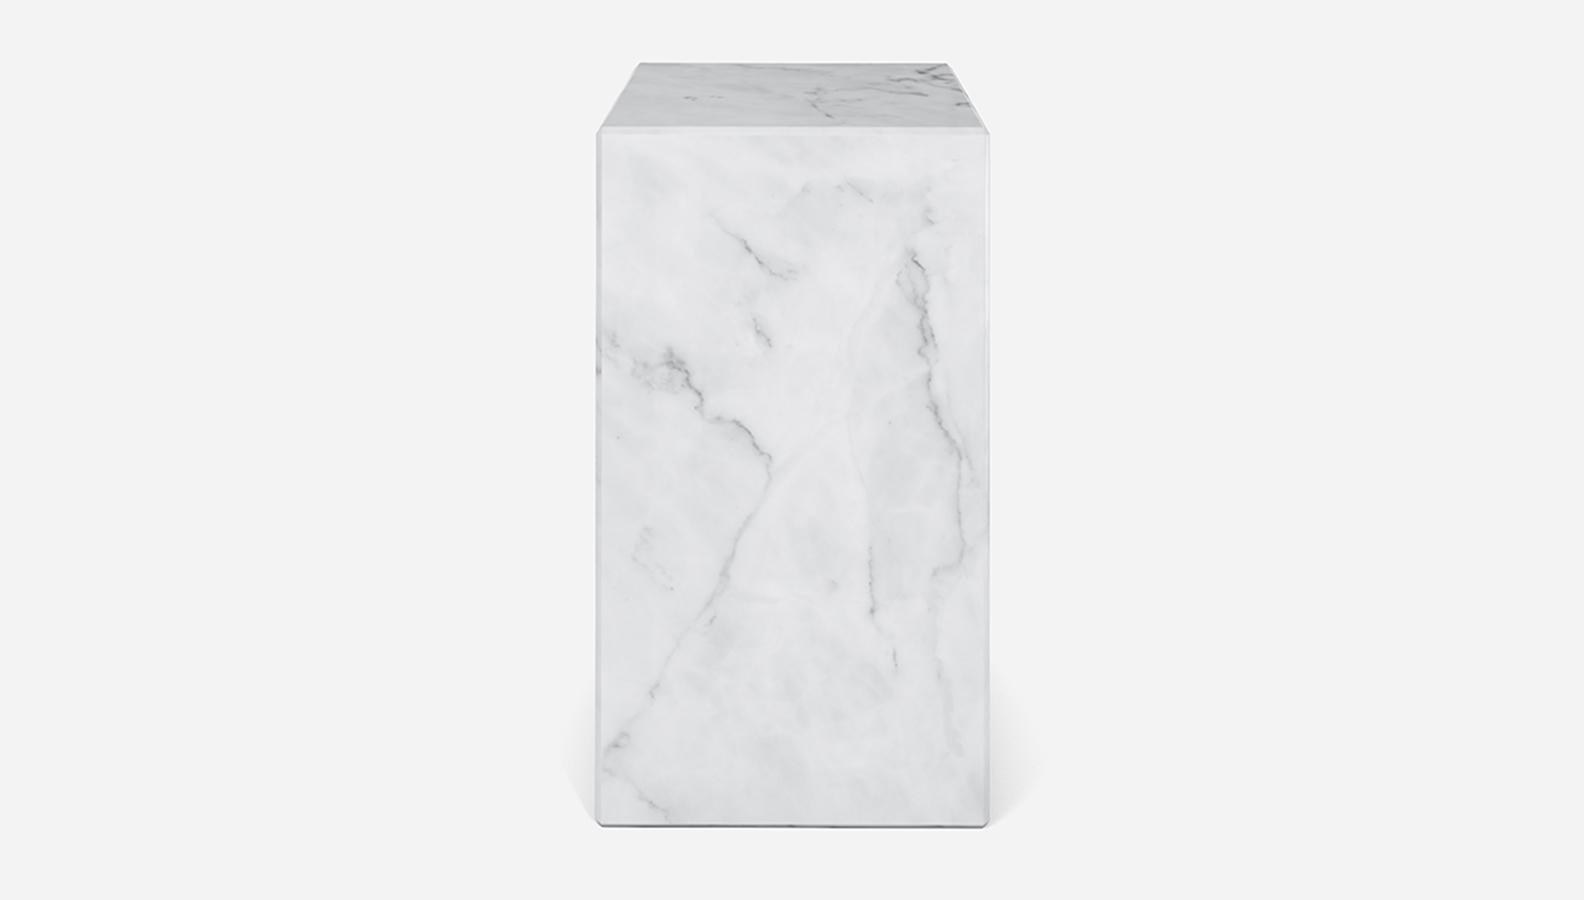 Aime Té Marmerblok Pilaar - Carrara Wit - 30  x 30  x 51